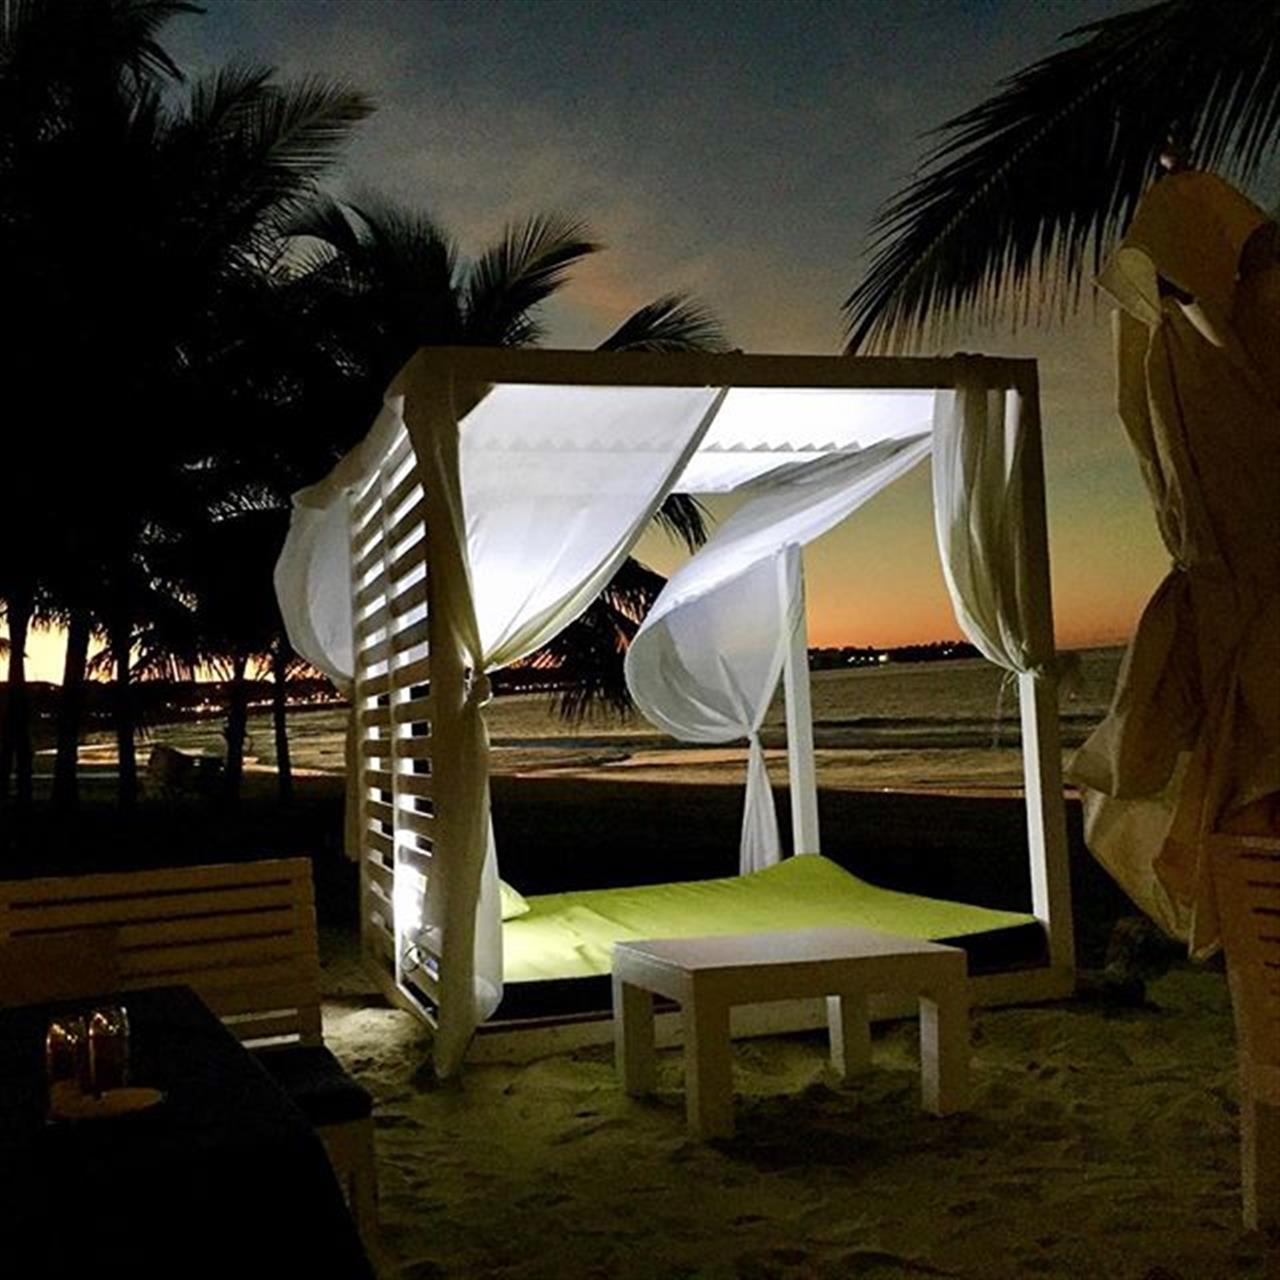 Cabarete At Night! #cabarete #cabaretebeach #dominicanrepublic #leadingrelocal #cabaretelifestyle #caribbean #caribbeanlife #beachfrontcondo